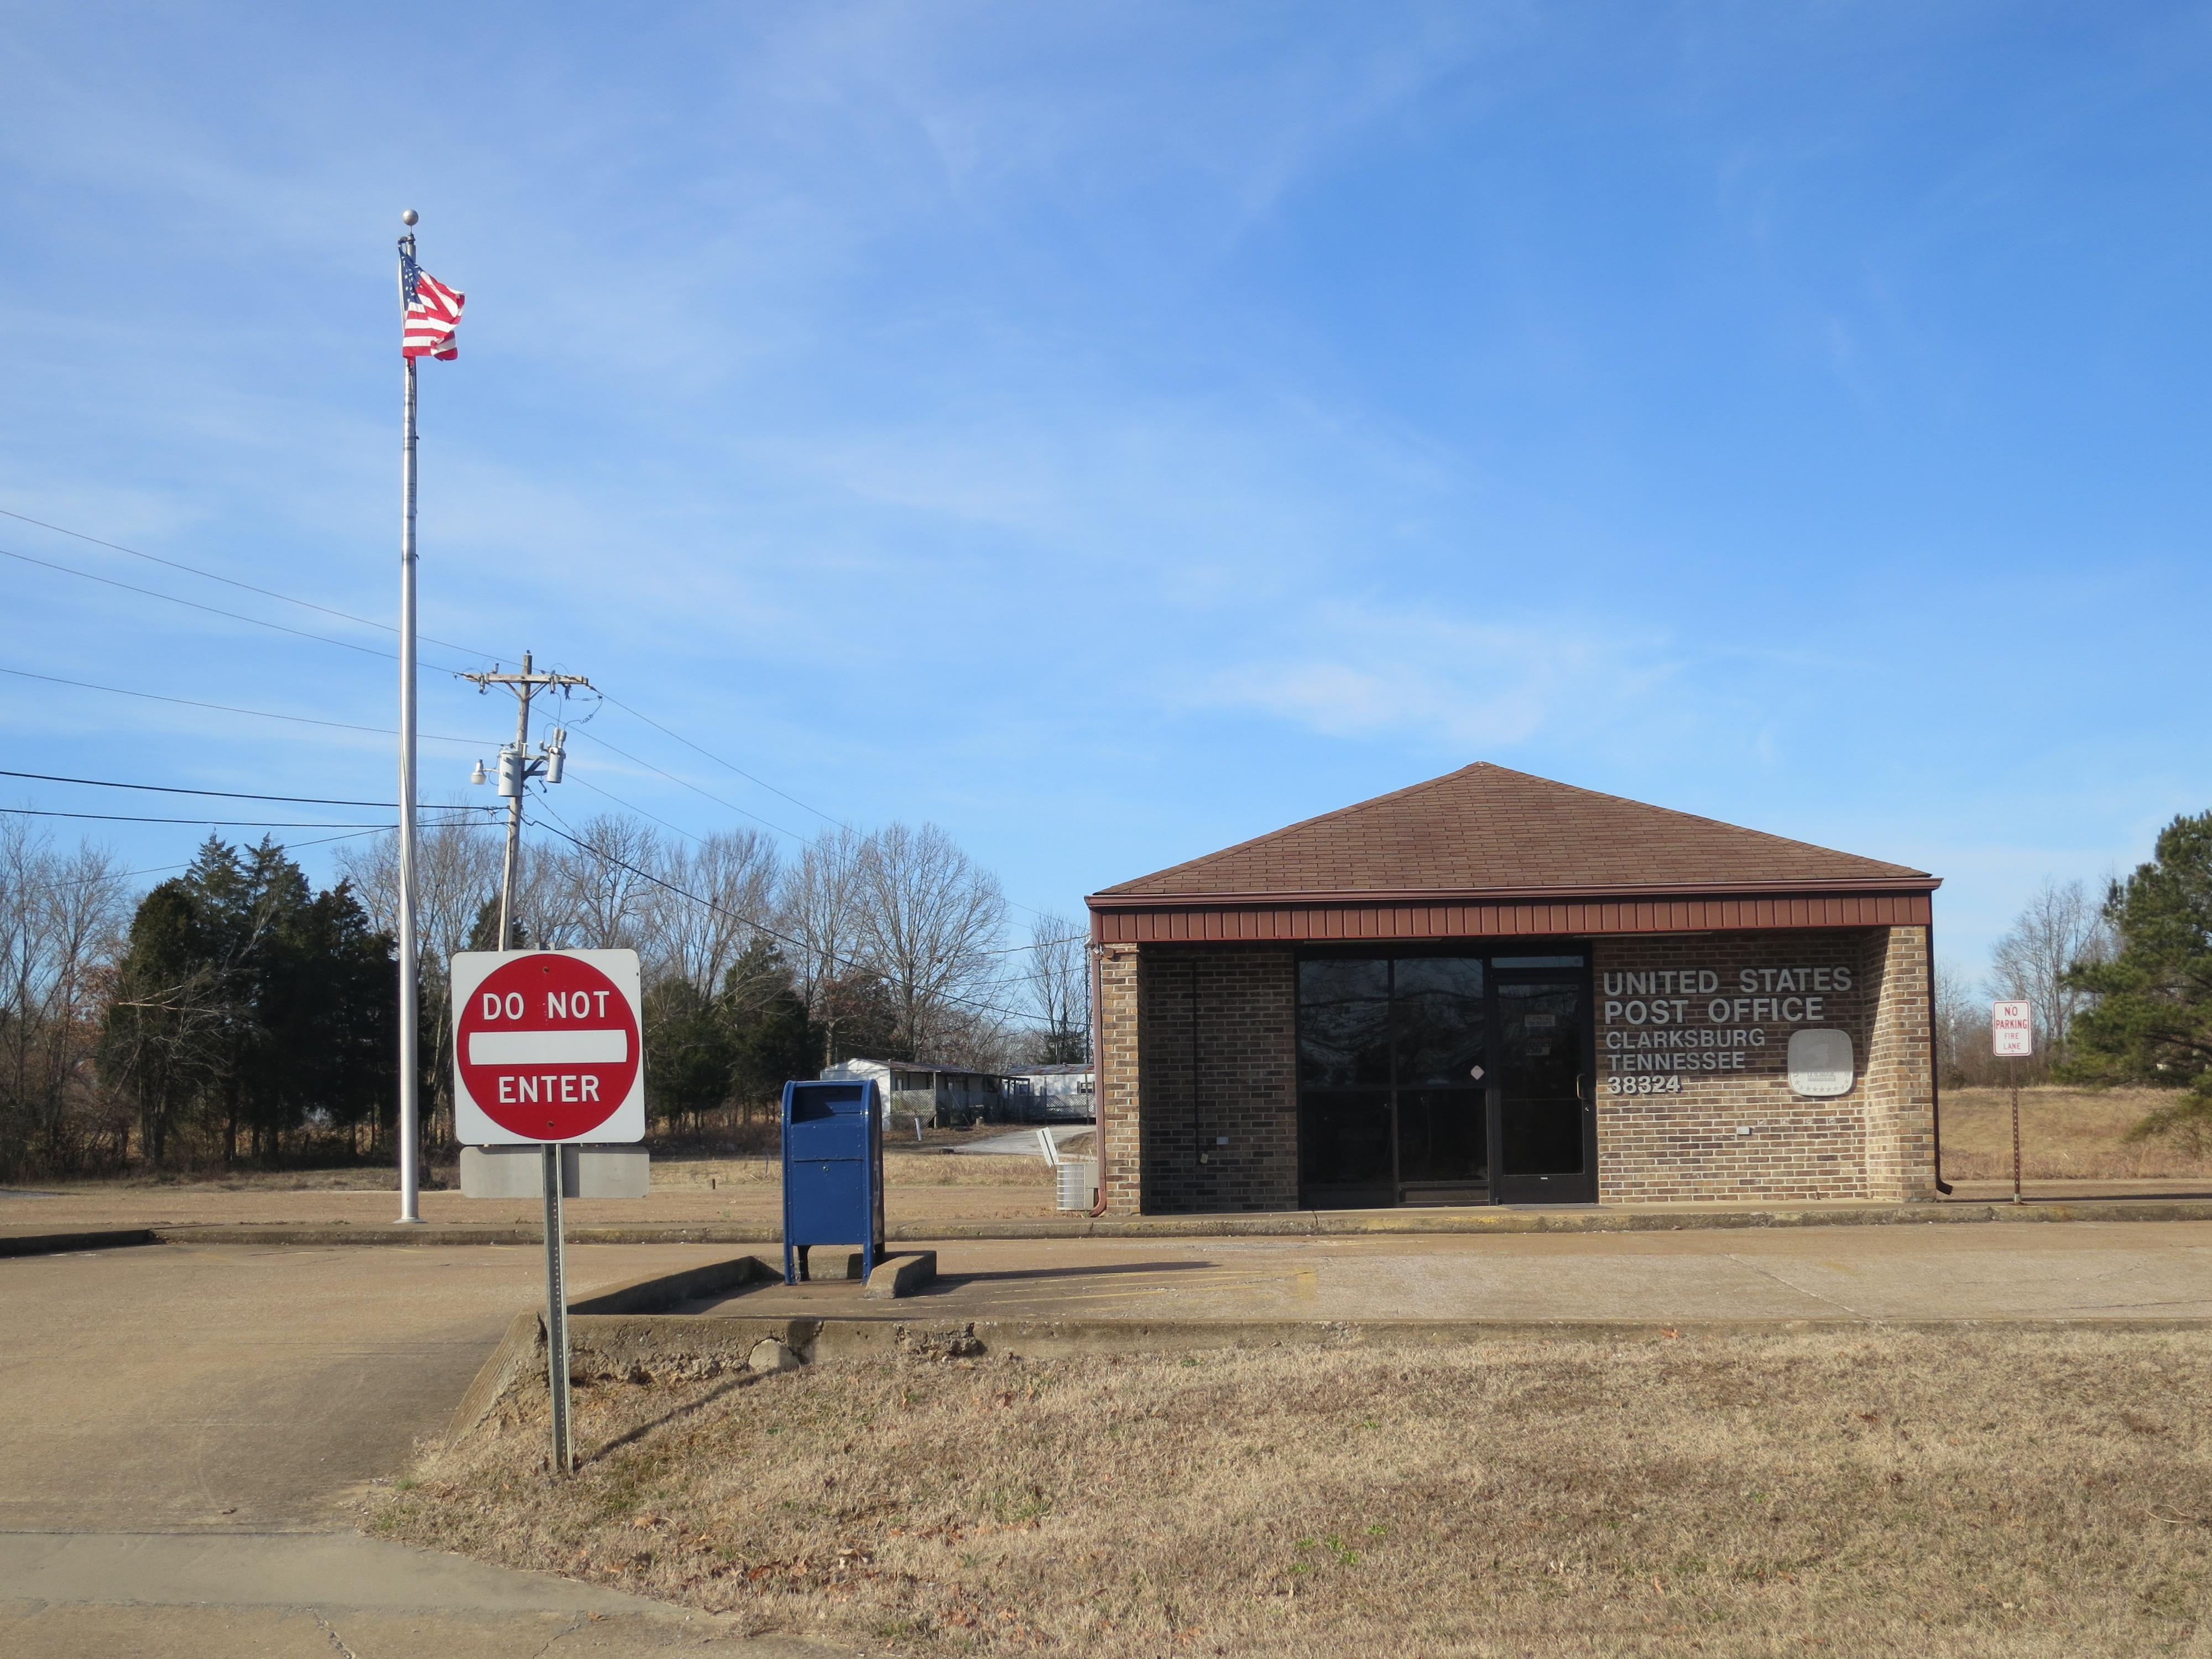 Tennessee carroll county clarksburg - Post_office_2 Jpg